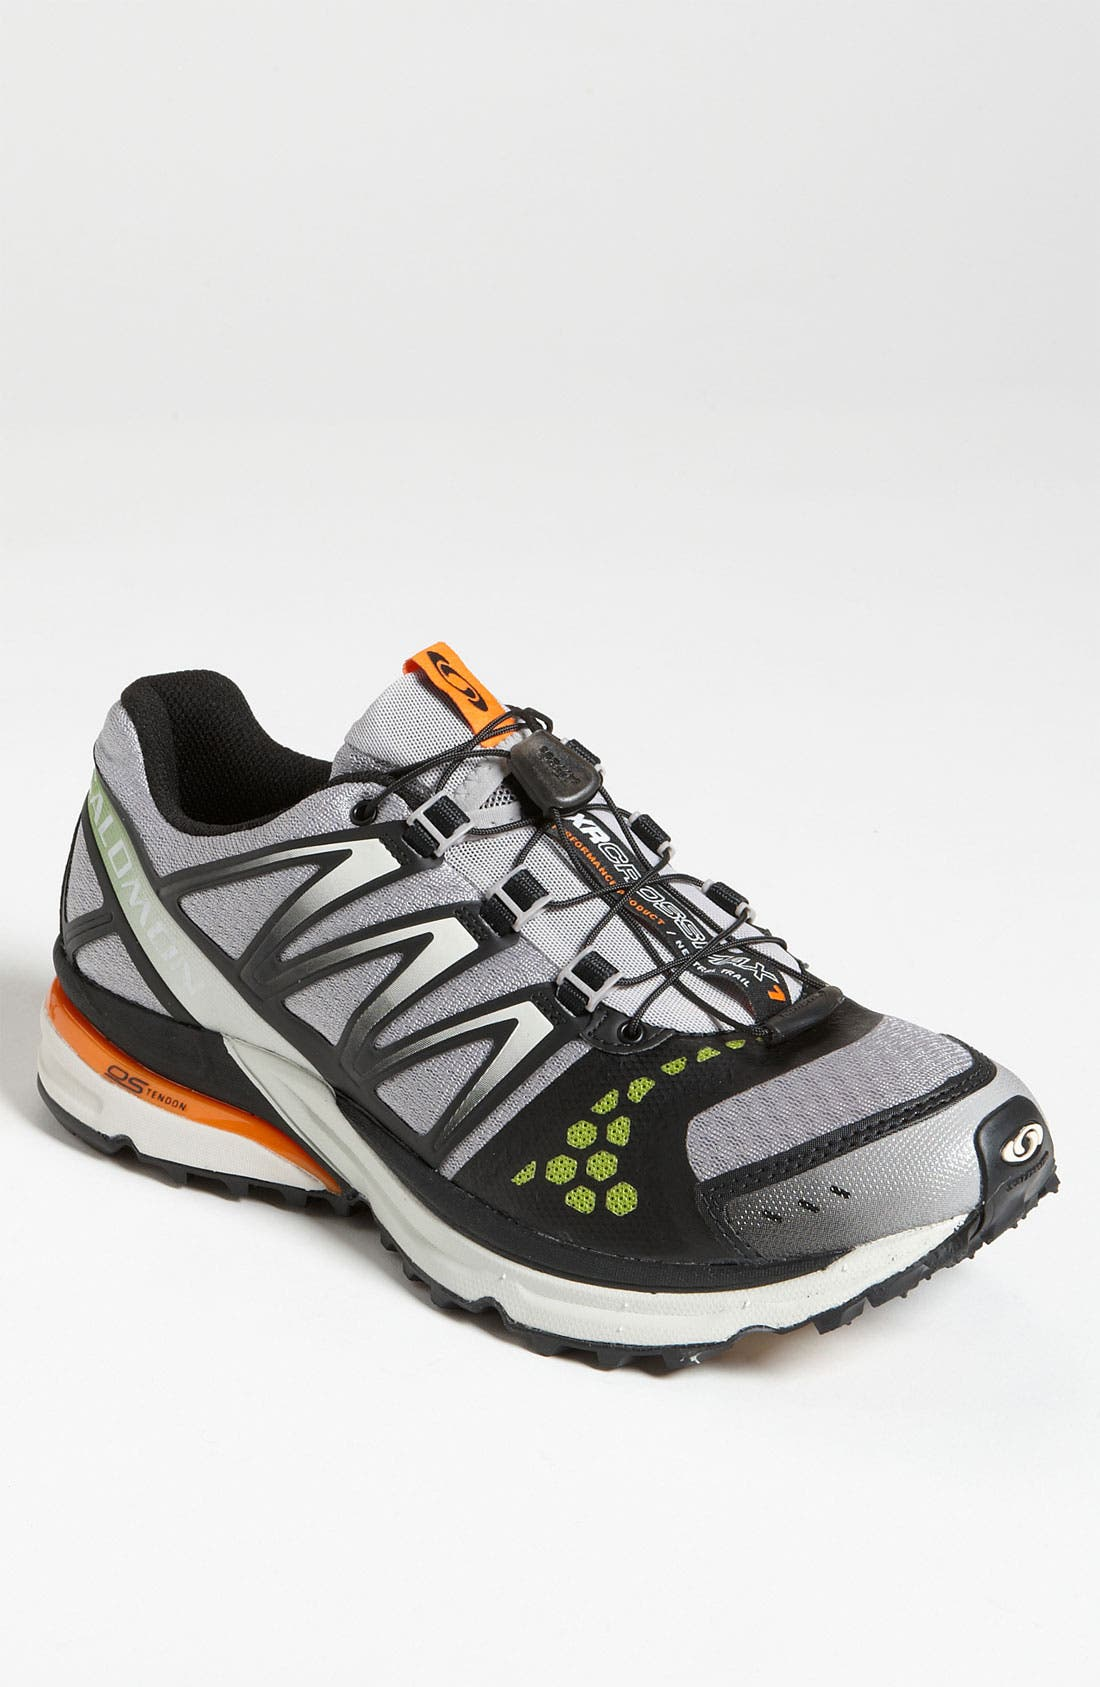 Main Image - Salomon 'Crossmax Neutral' Trail Running Shoe (Men) (Online Only)